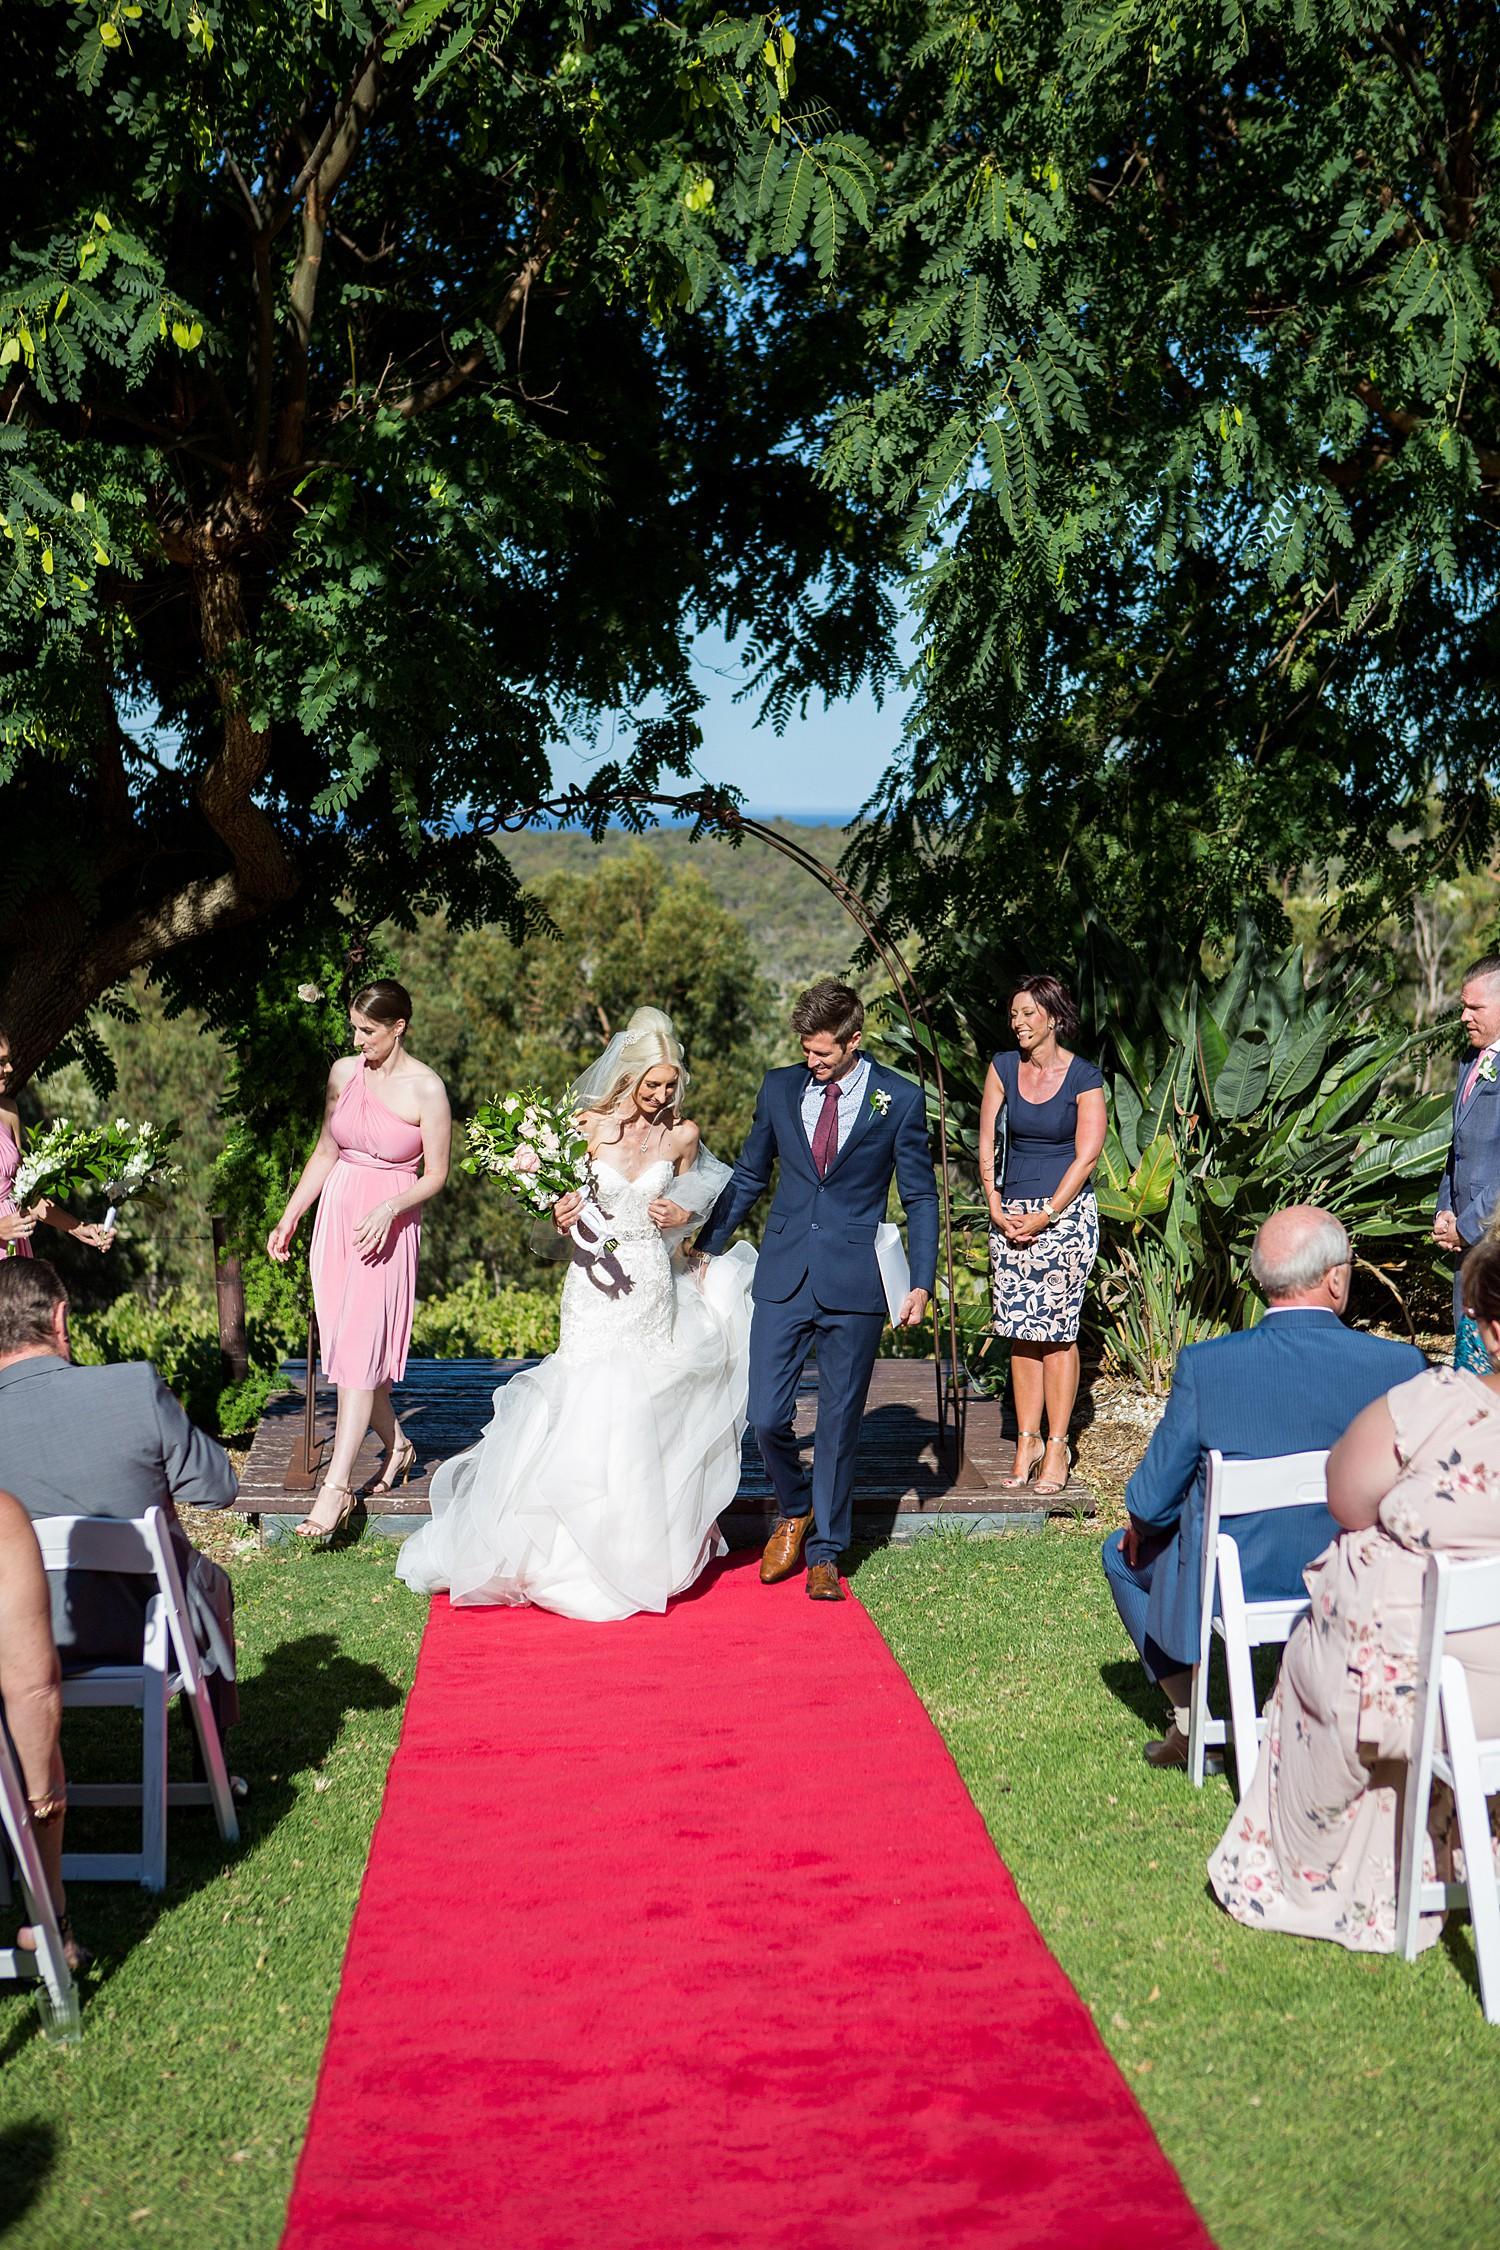 wise_wines_southwest_WA_wedding_0069.jpg